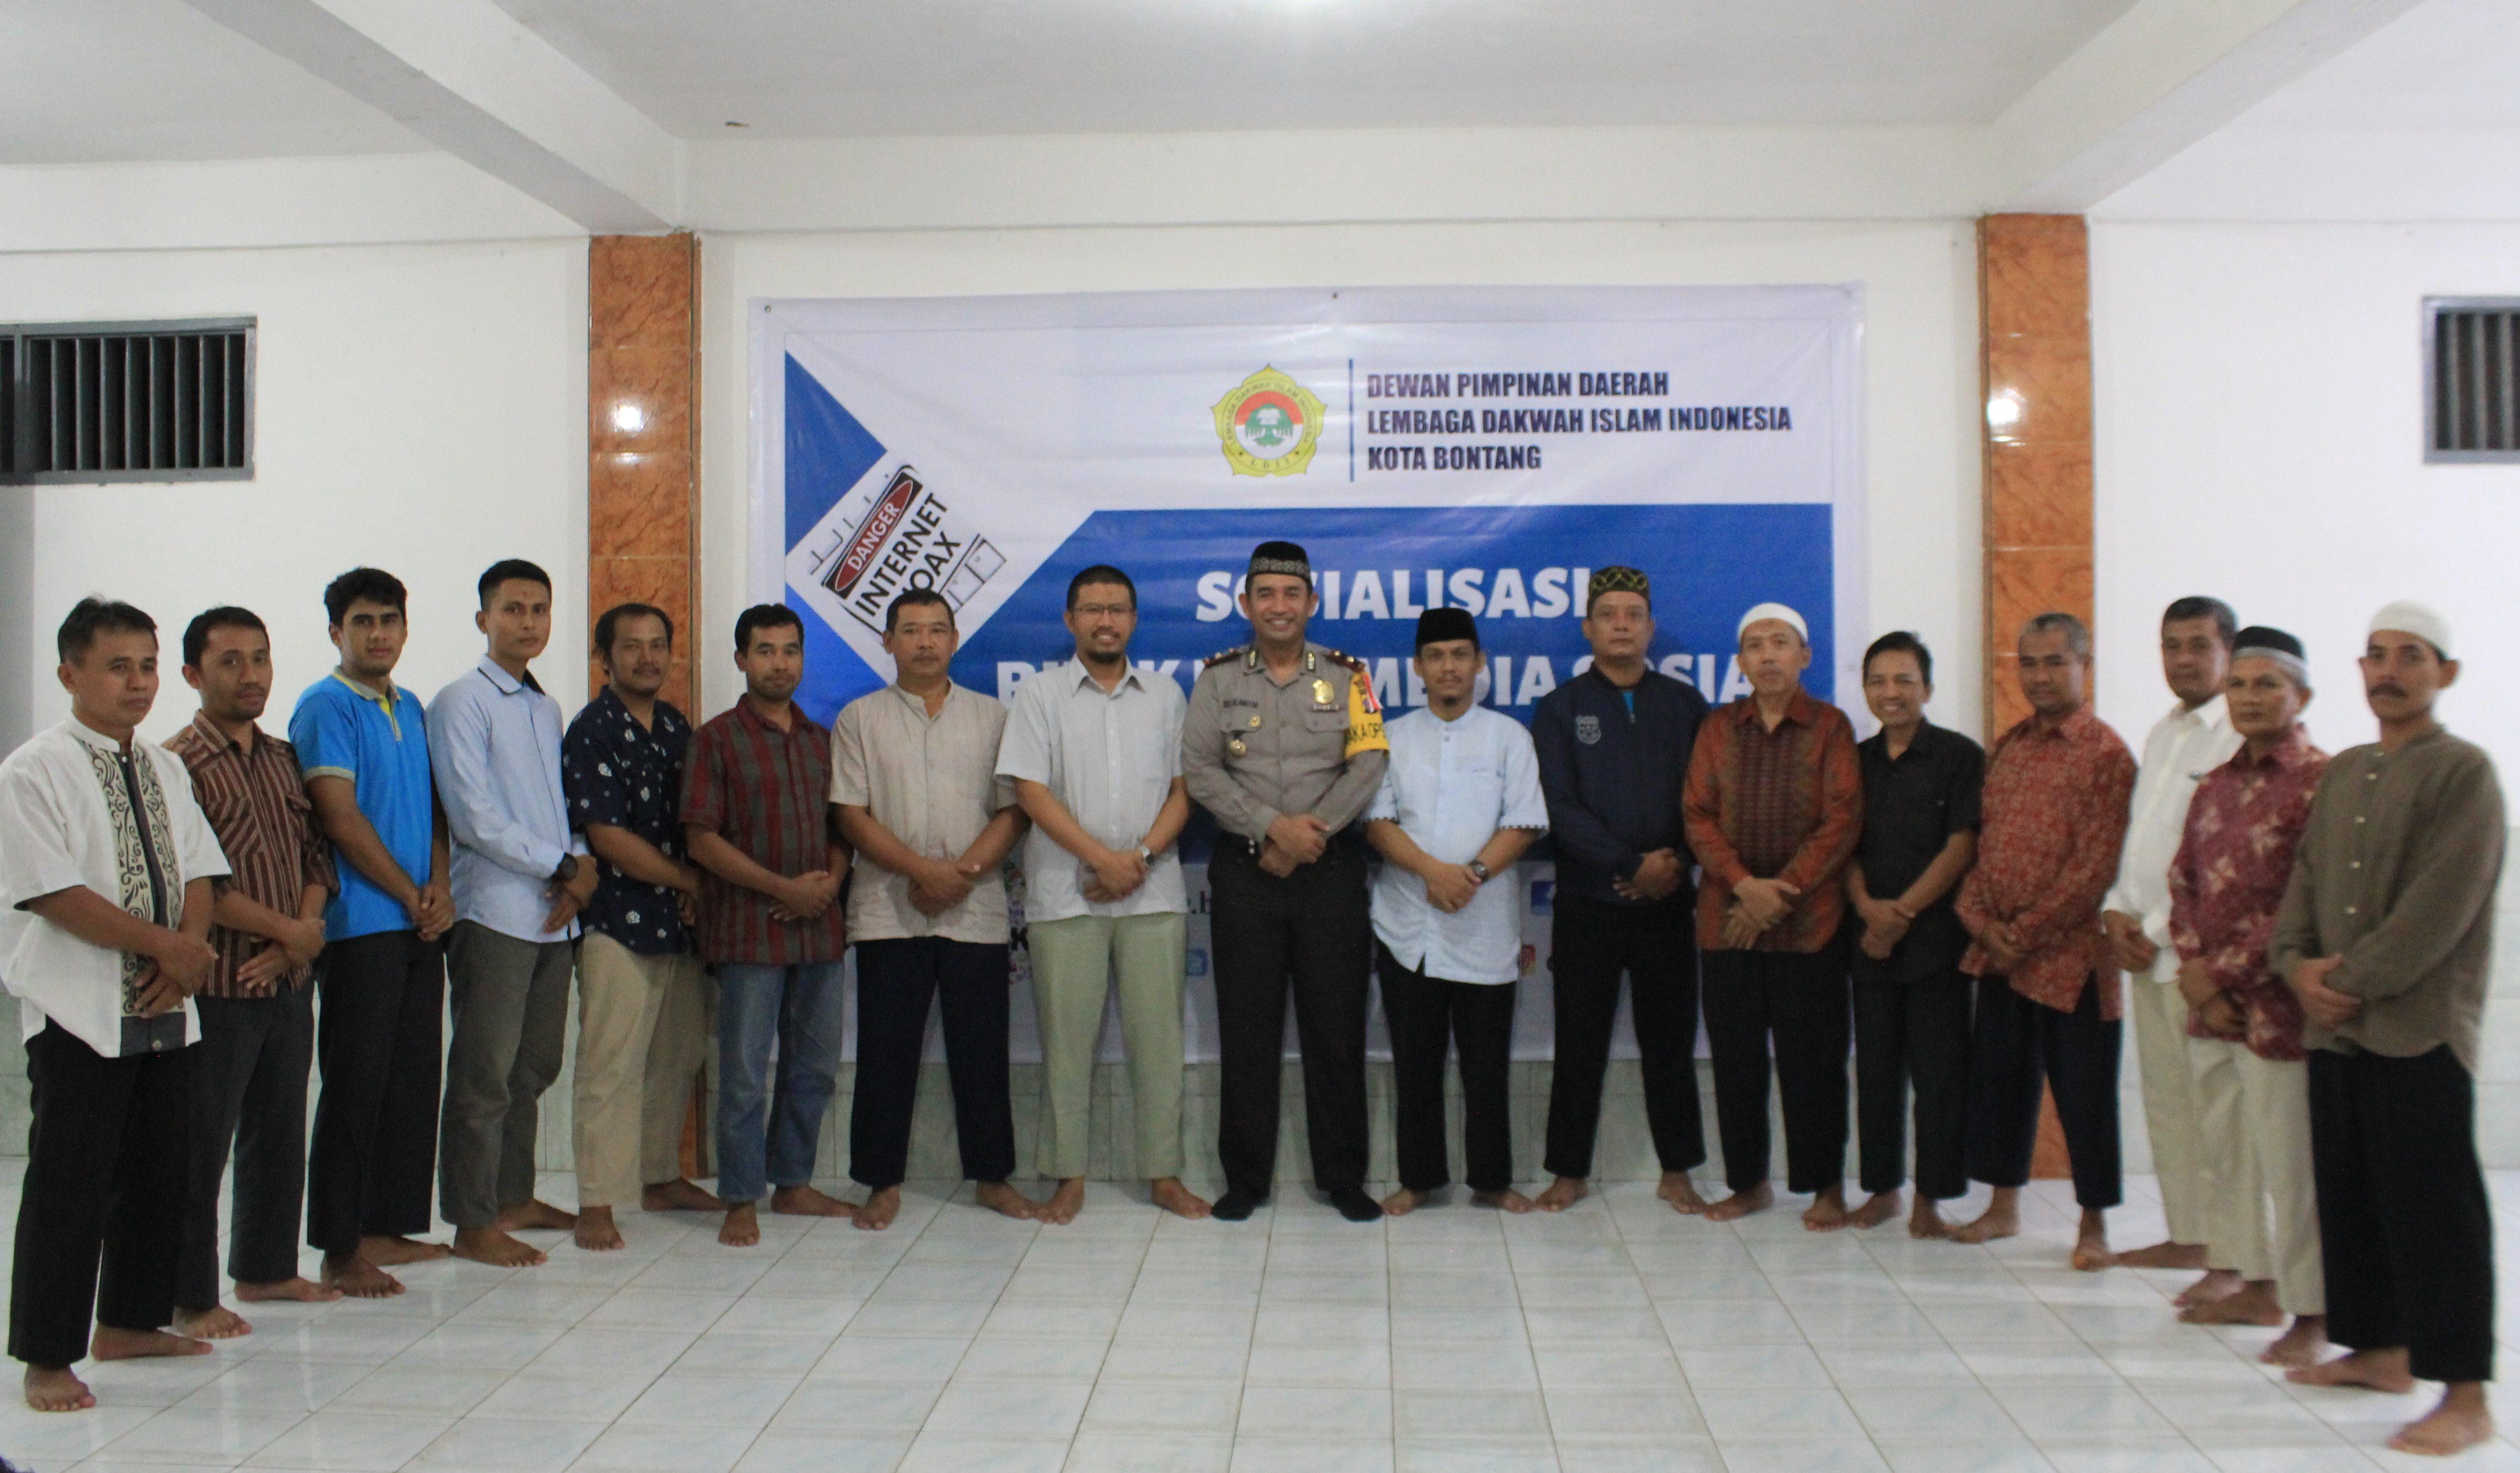 Tangkal Hoax, LDII Kota Bontang Bekali Pengurus Bijak Ber-Media Sosial